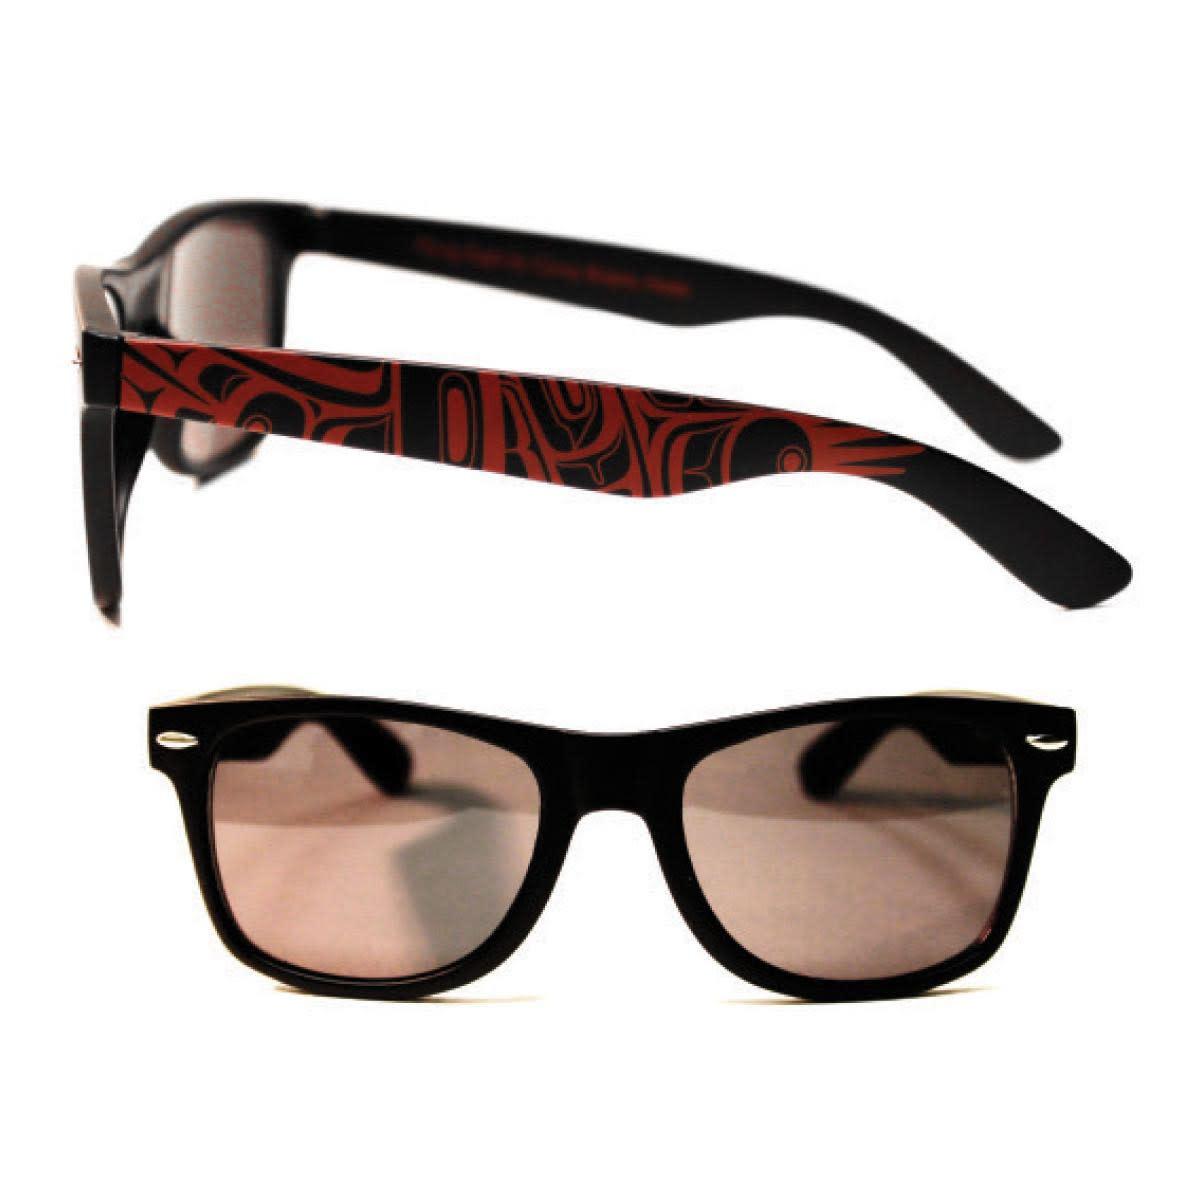 SunGlasses - Adult-6